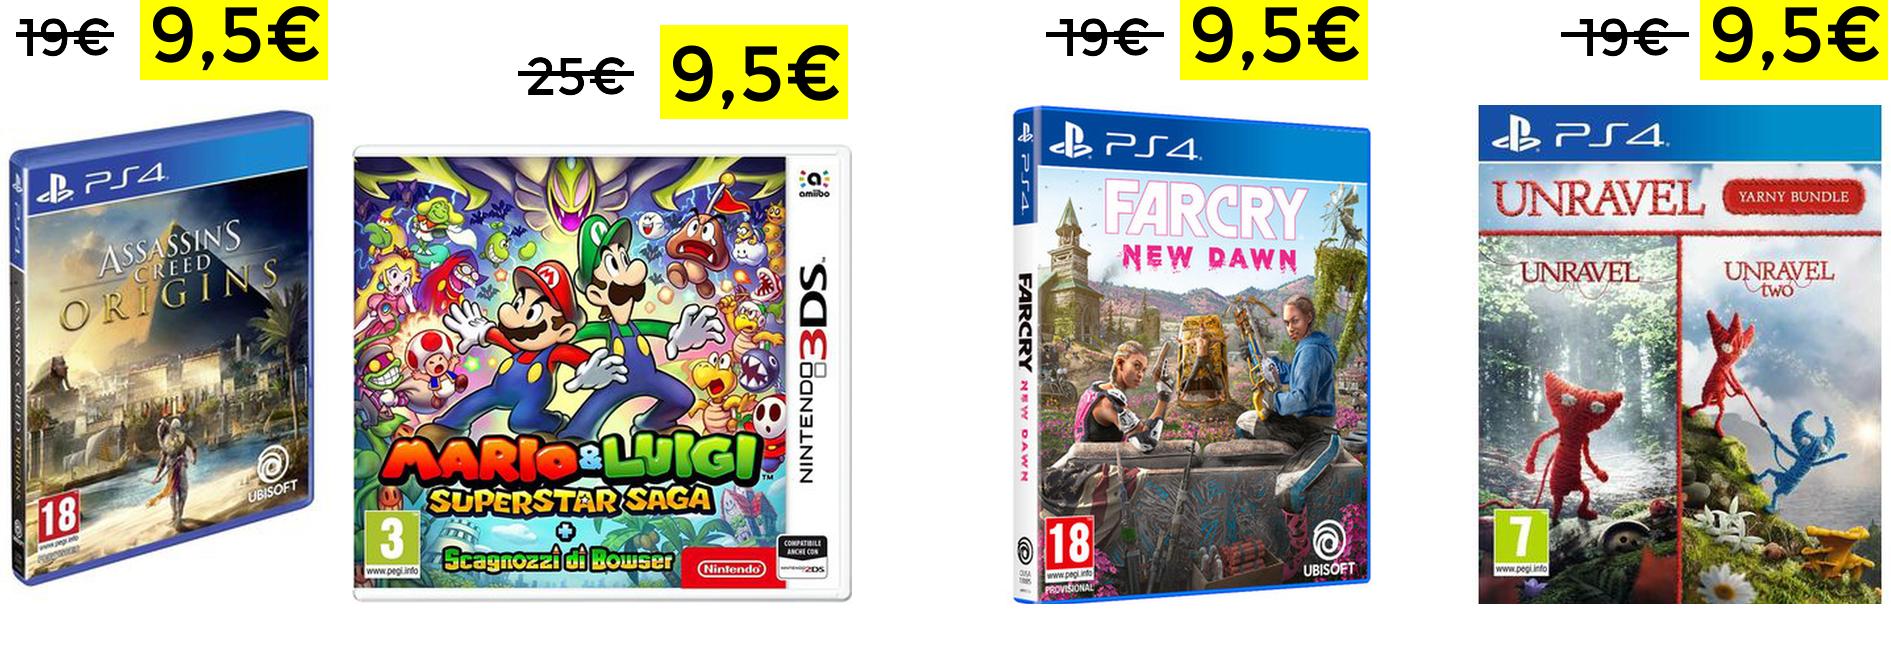 Mario & Luigi Superstar 3DS PS4 9,5€